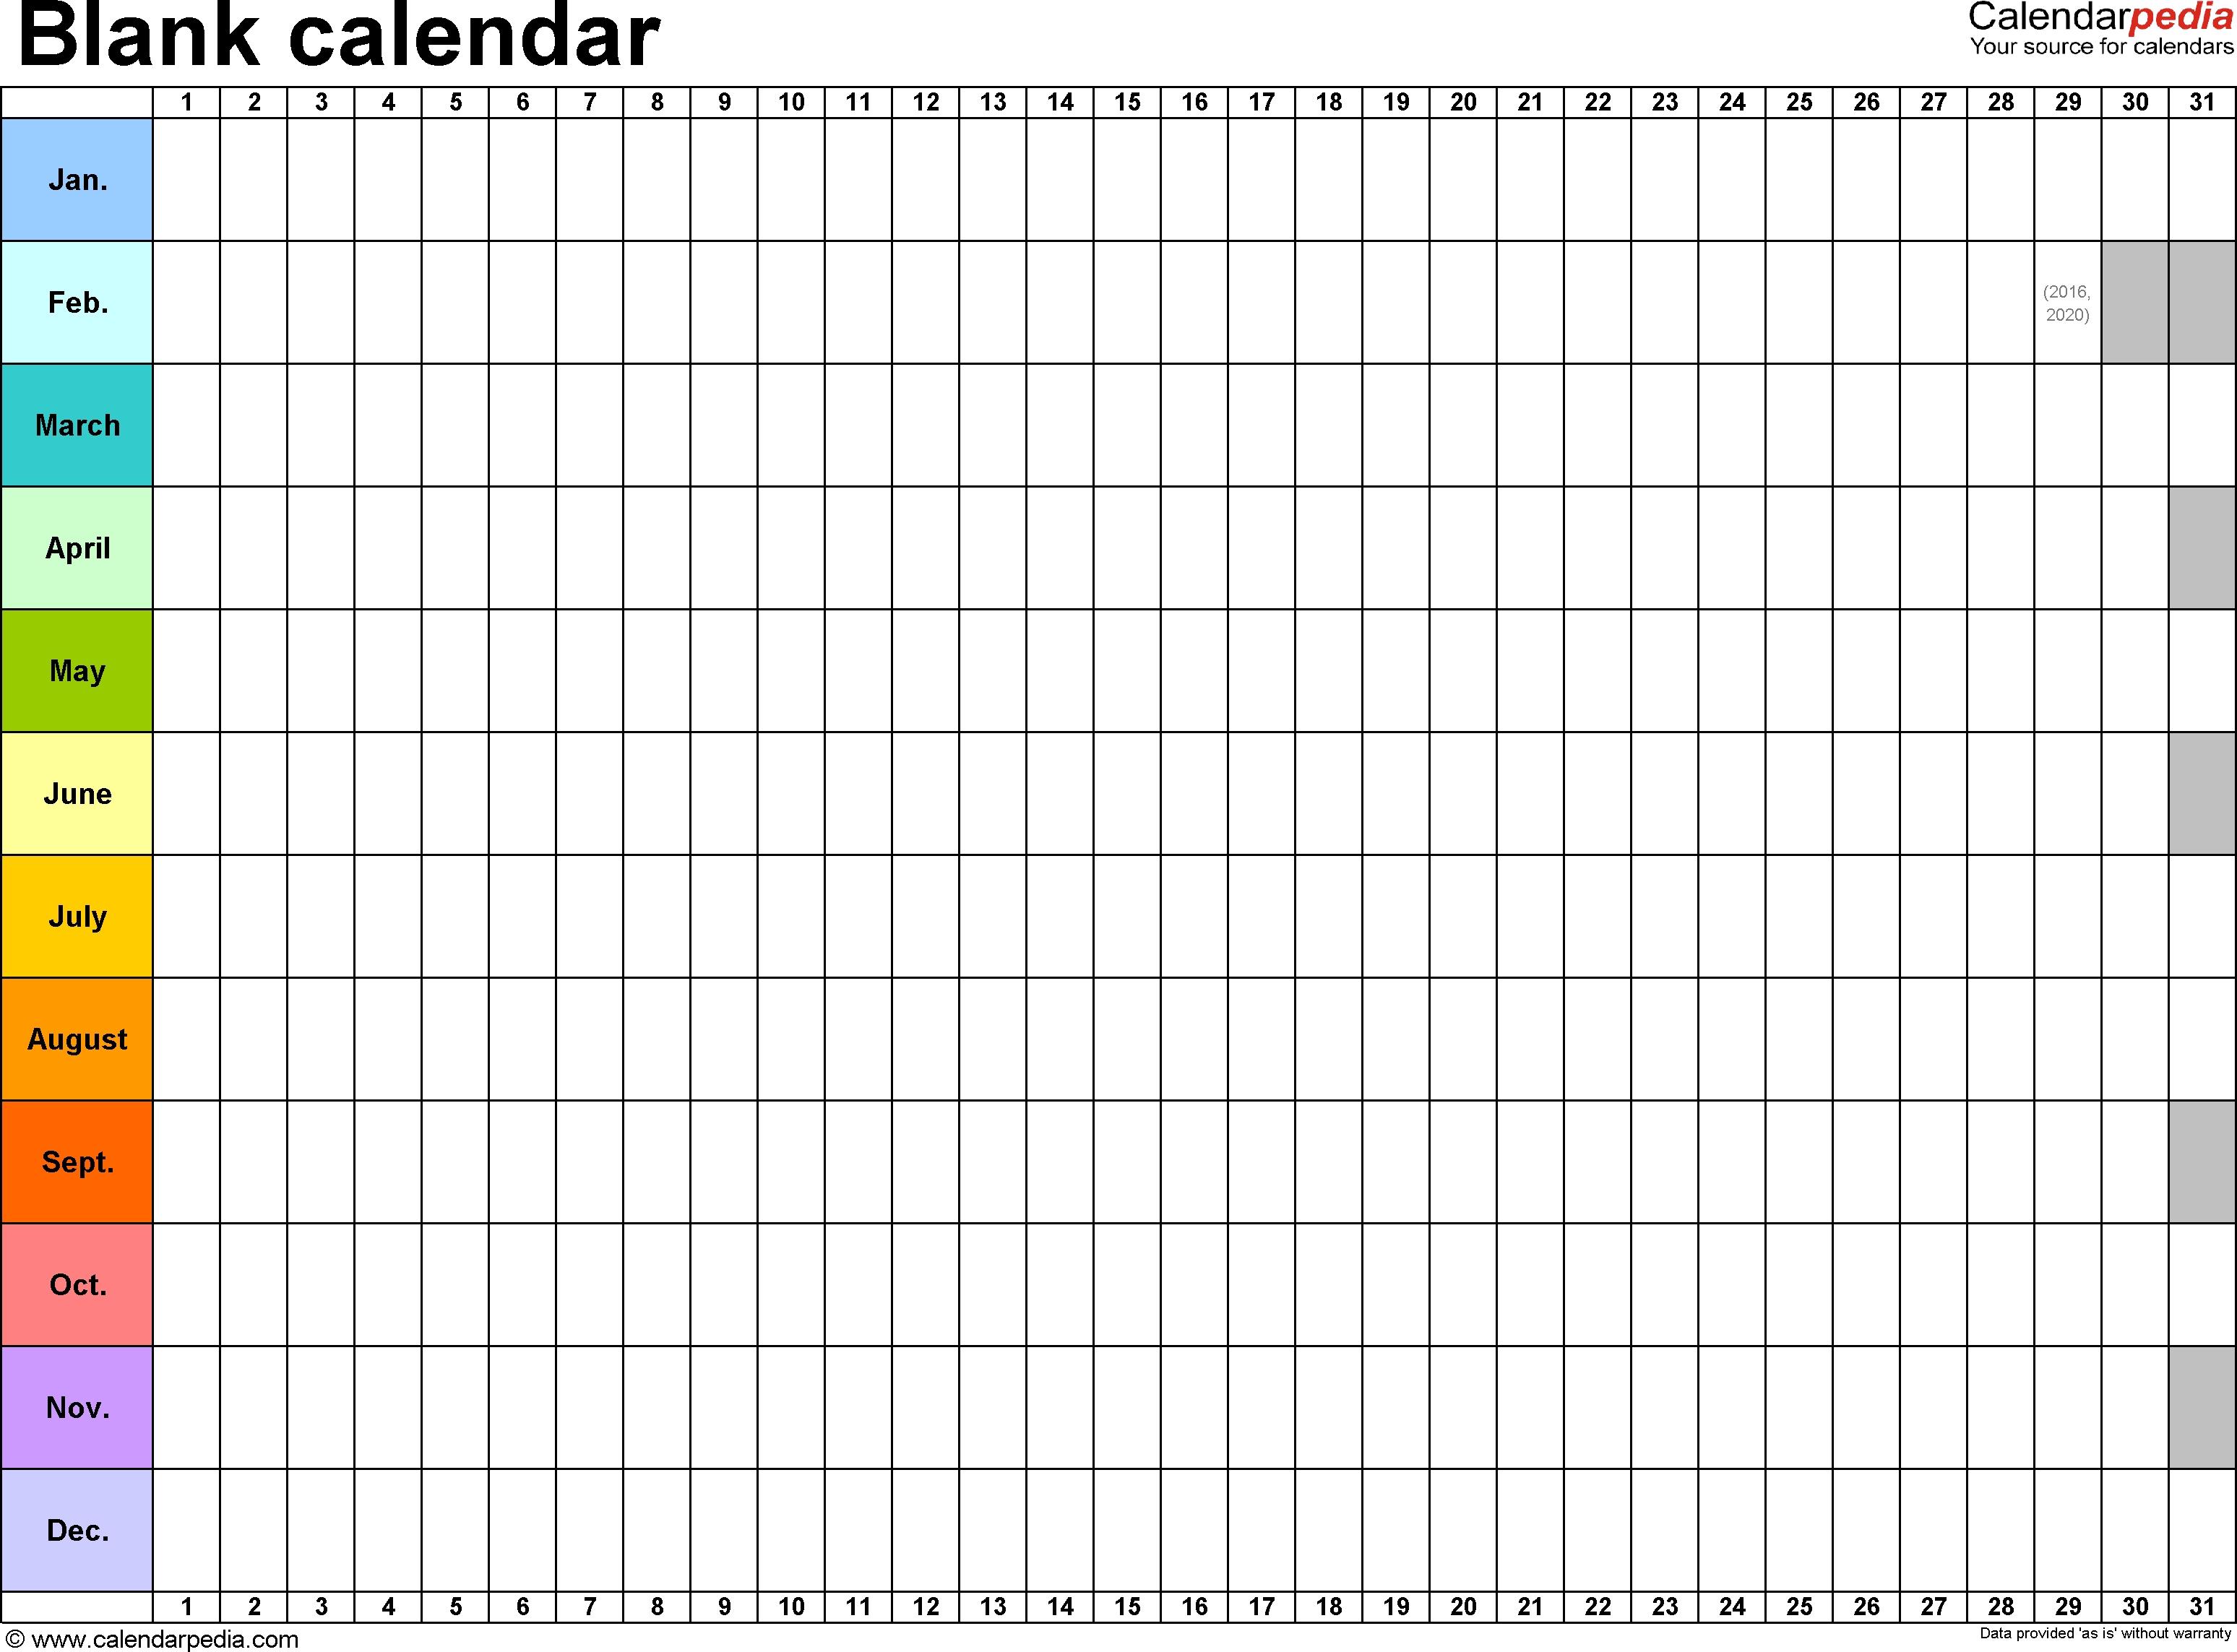 Blank Calendar - 9 Free Printable Microsoft Word Templates throughout Editable Printable Calendars By Month